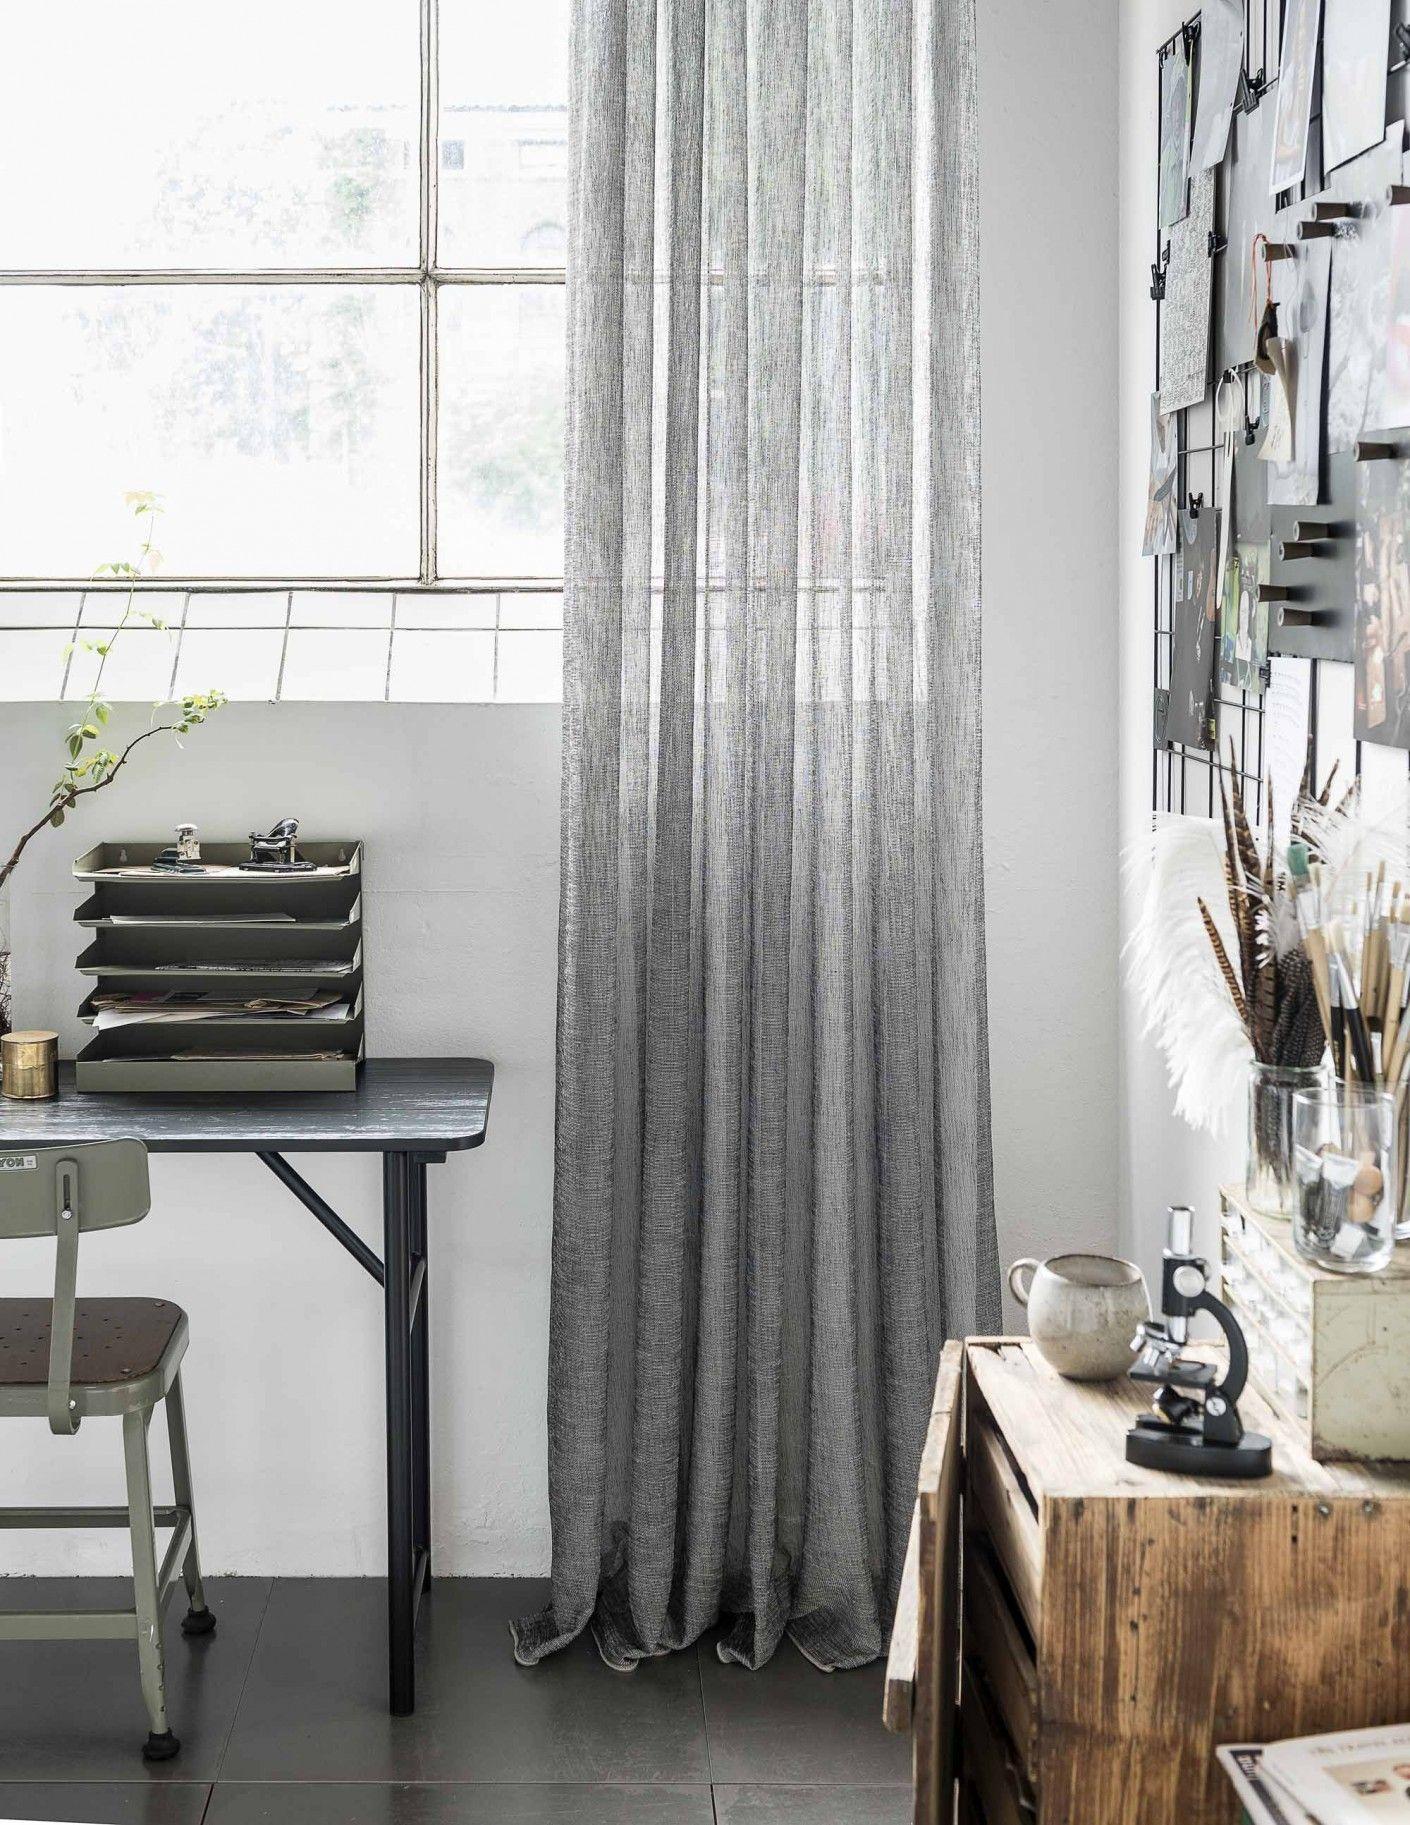 vtwonen gordijnen vtwonen curtains fotografie sjoerd eickmans styling kim van rossenberg